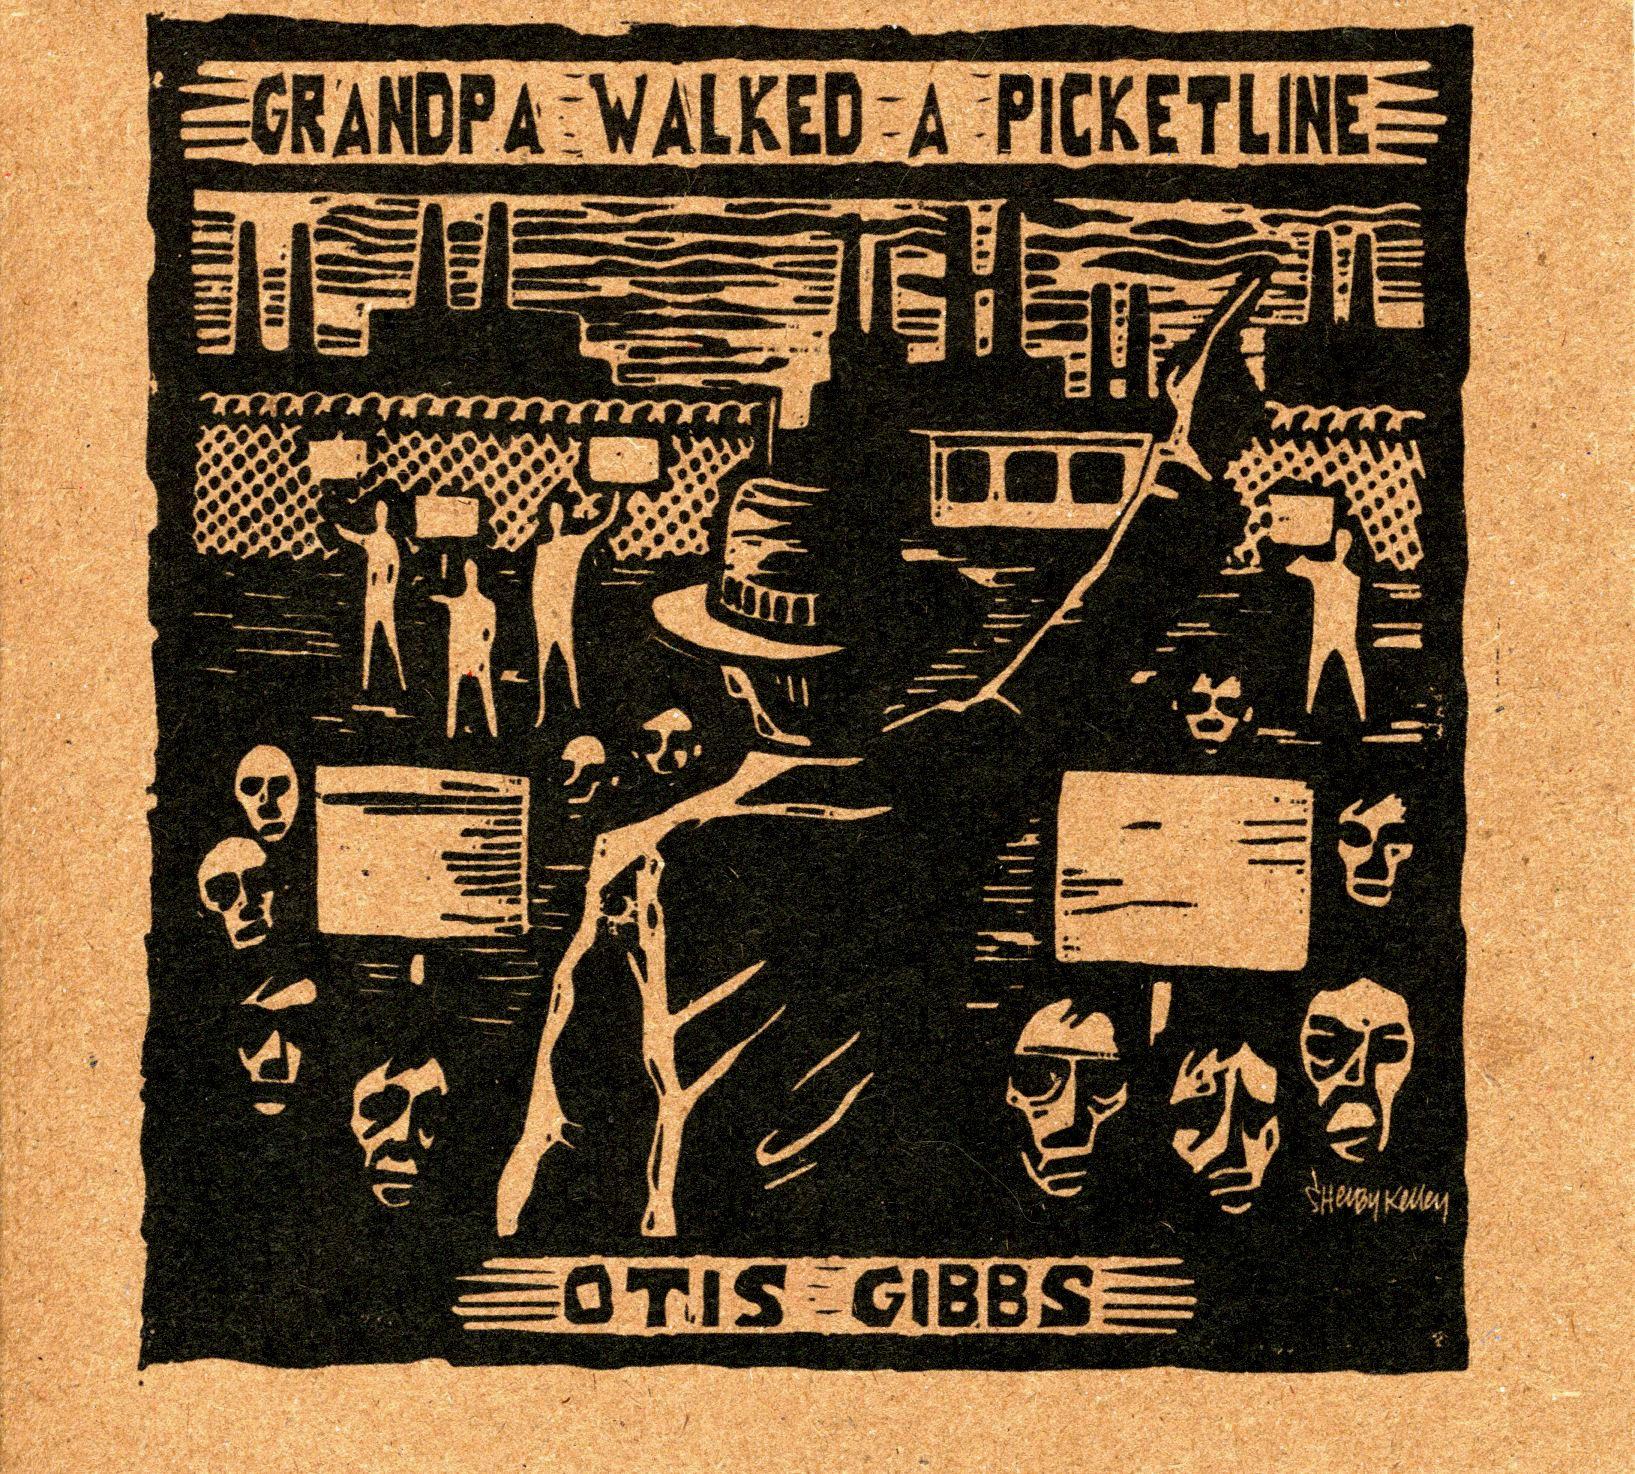 Grandpa Walked A Picketline  by Otis Gibbs